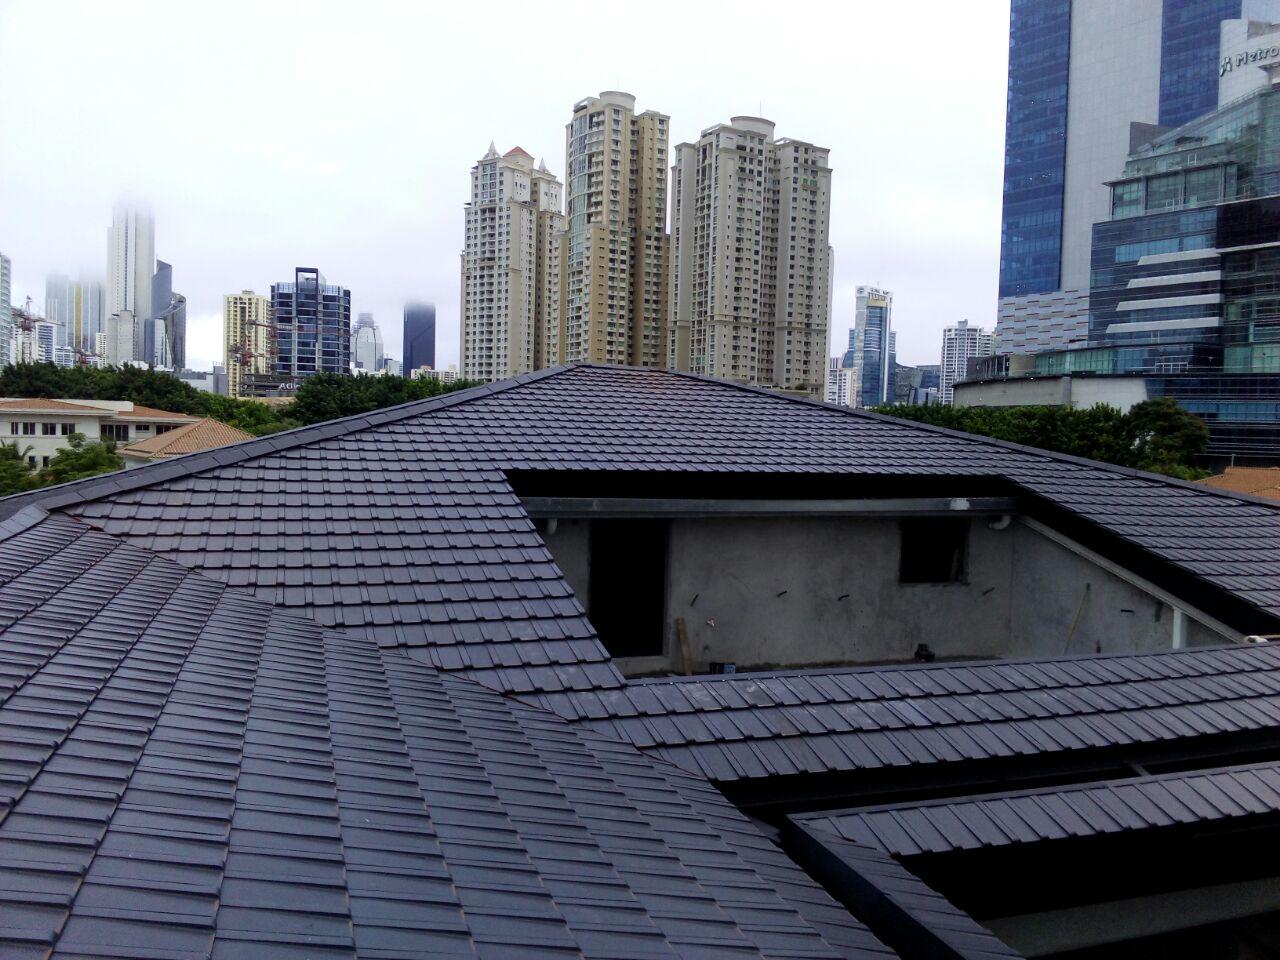 TVPK  3 - Panamá